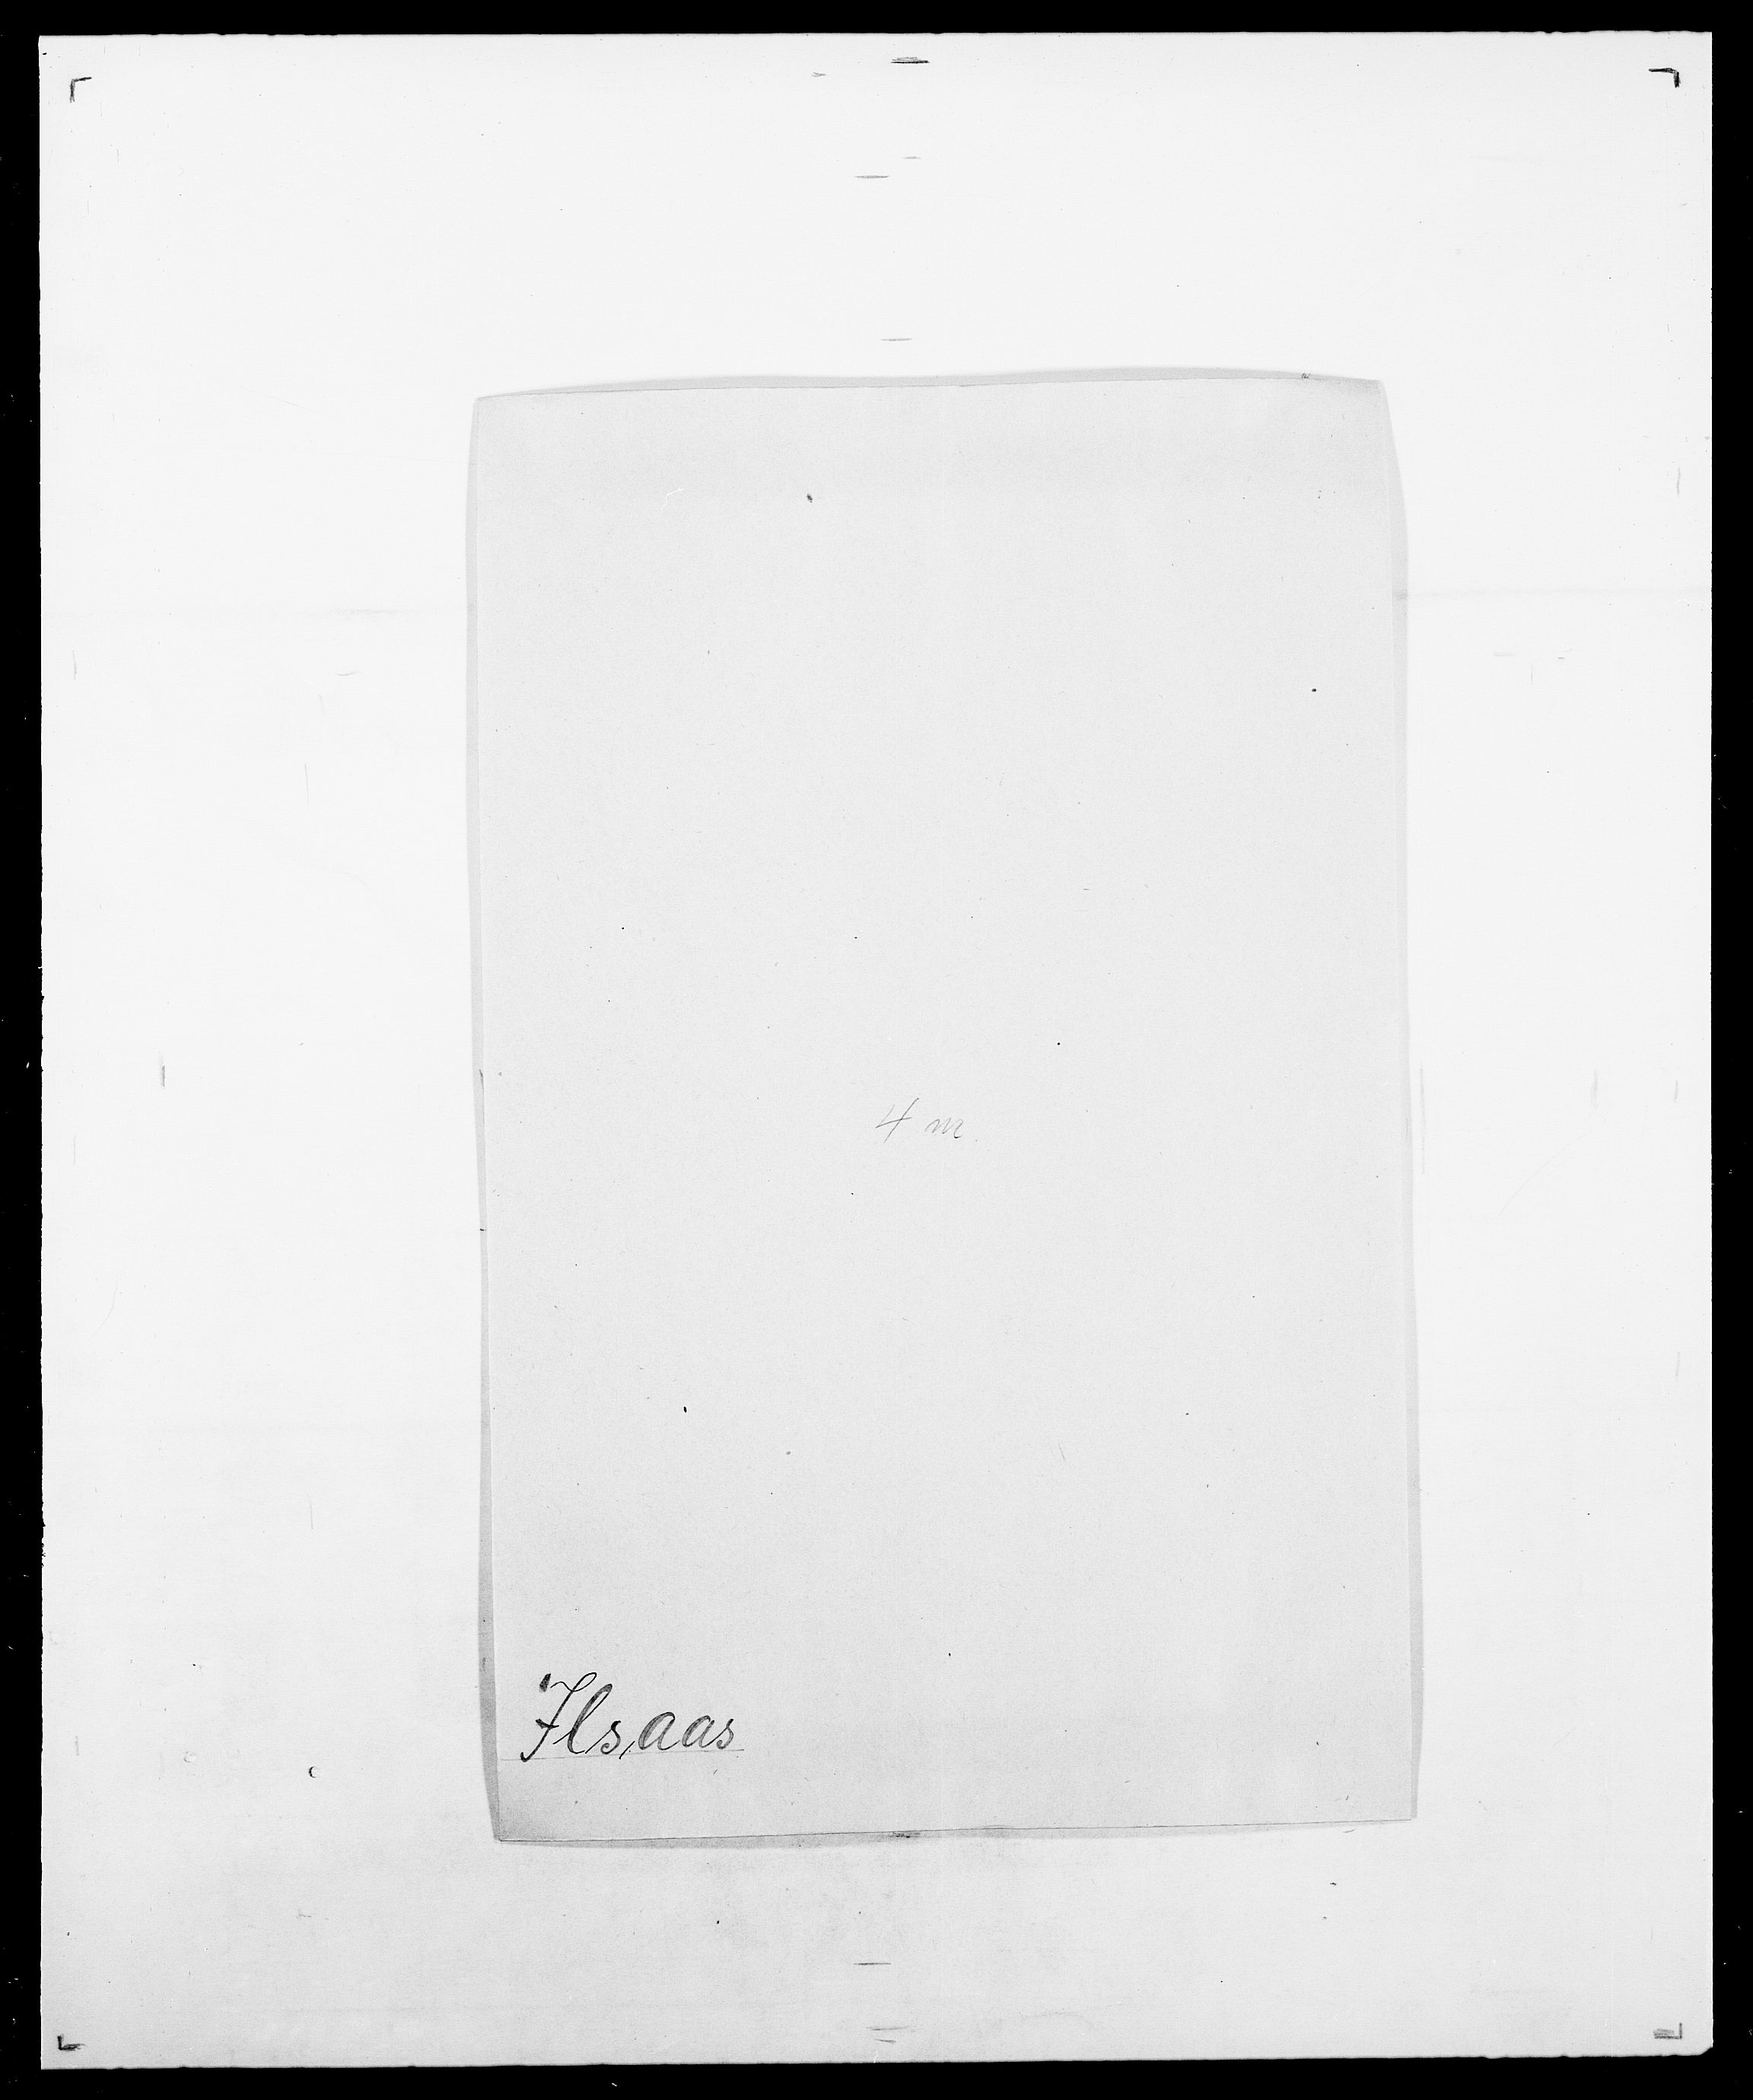 SAO, Delgobe, Charles Antoine - samling, D/Da/L0019: van der Hude - Joys, s. 771